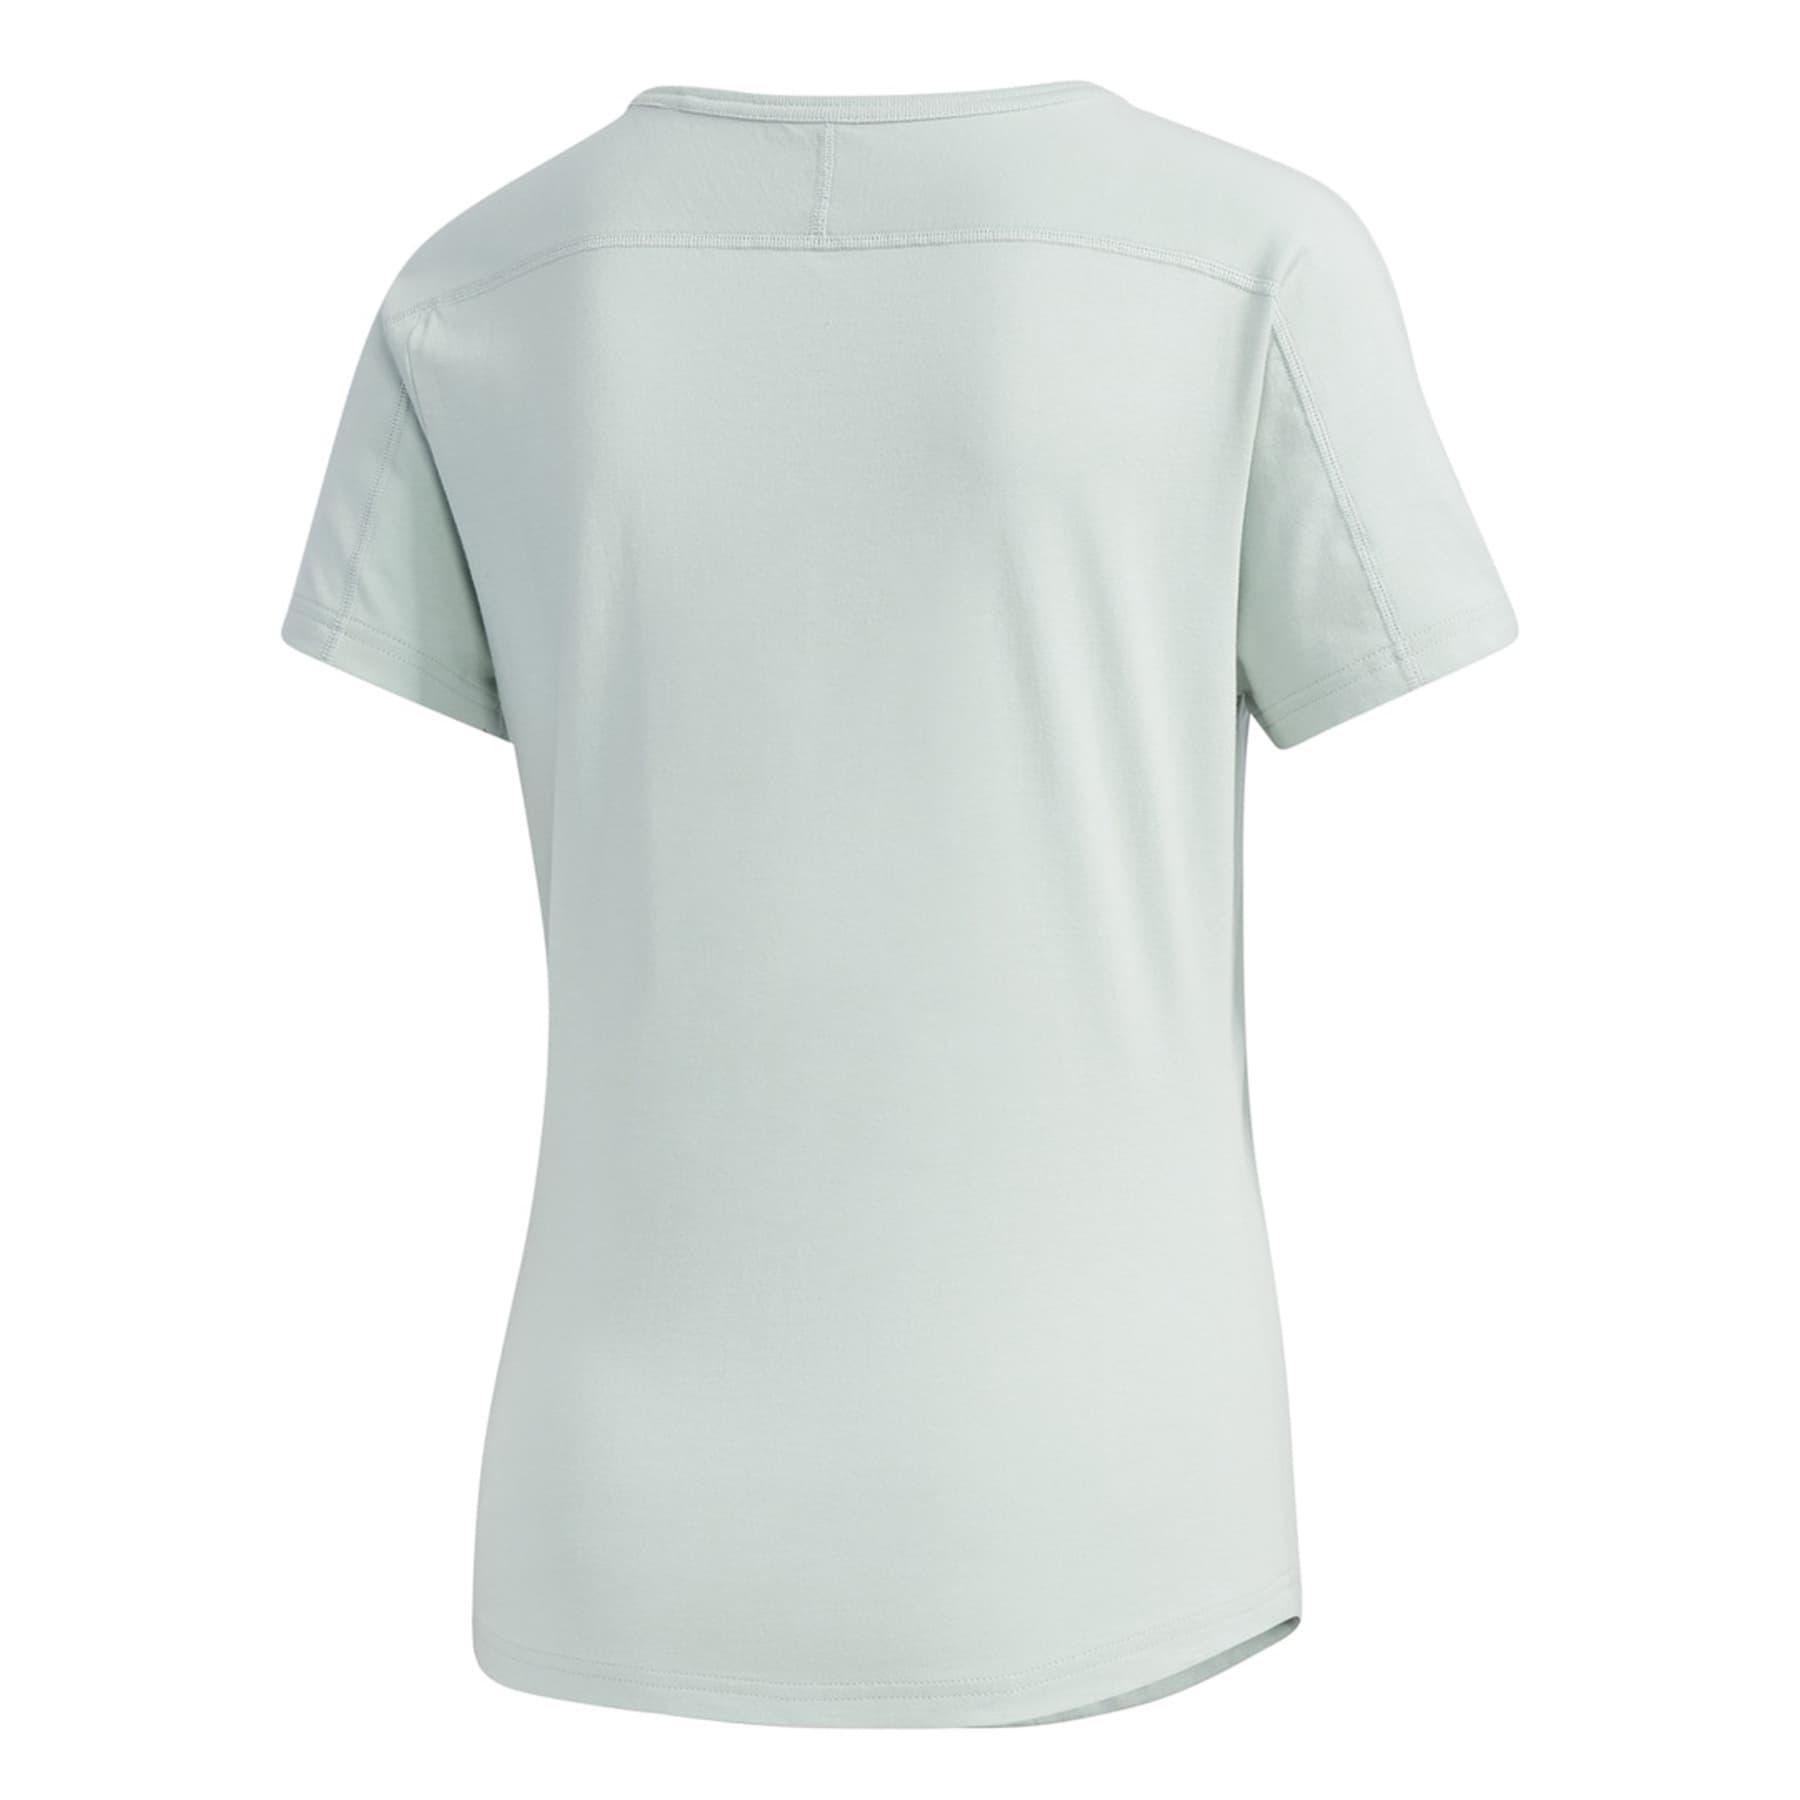 Brilliant Basics Kadın Yeşil Spor Tişört (FM6201)